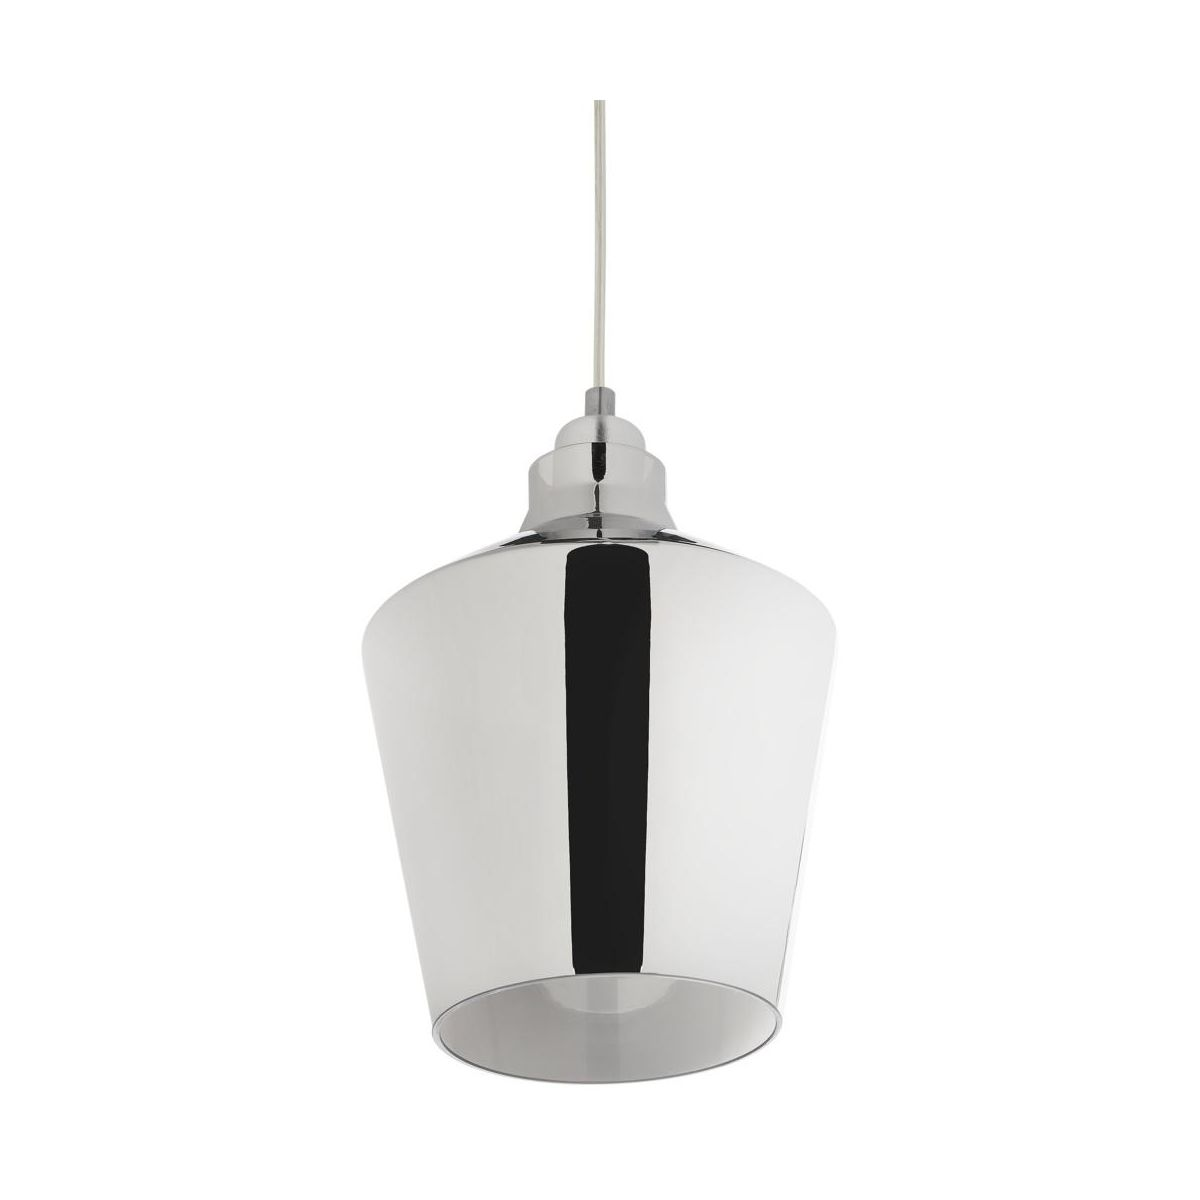 lampa wisz ca calais serie lamp w atrakcyjnej cenie w. Black Bedroom Furniture Sets. Home Design Ideas